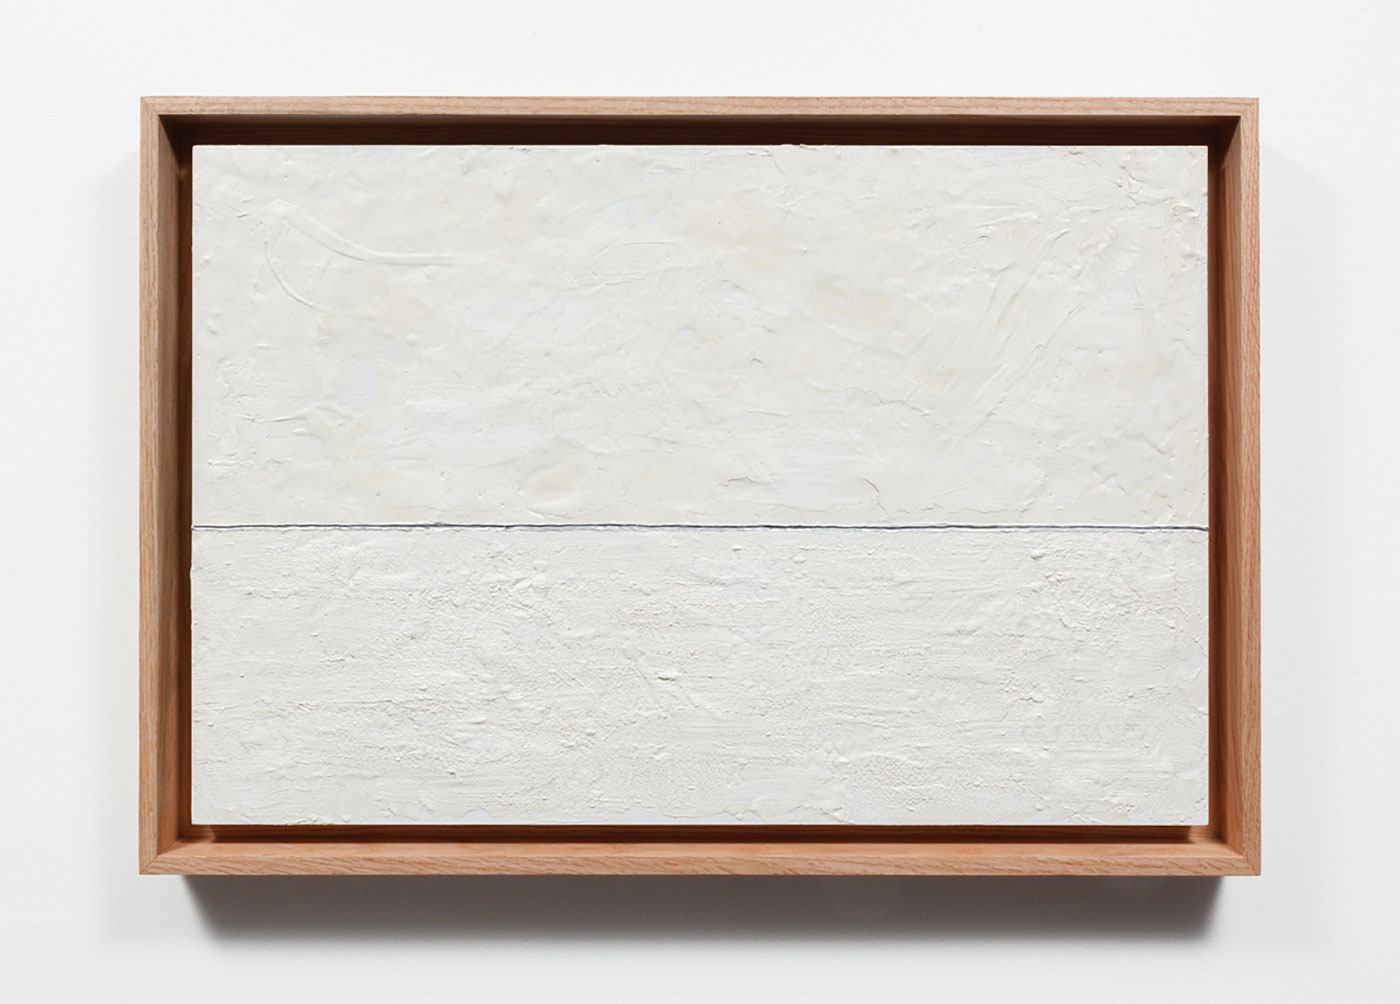 David Cavaliero - Horizon (Silver Line)